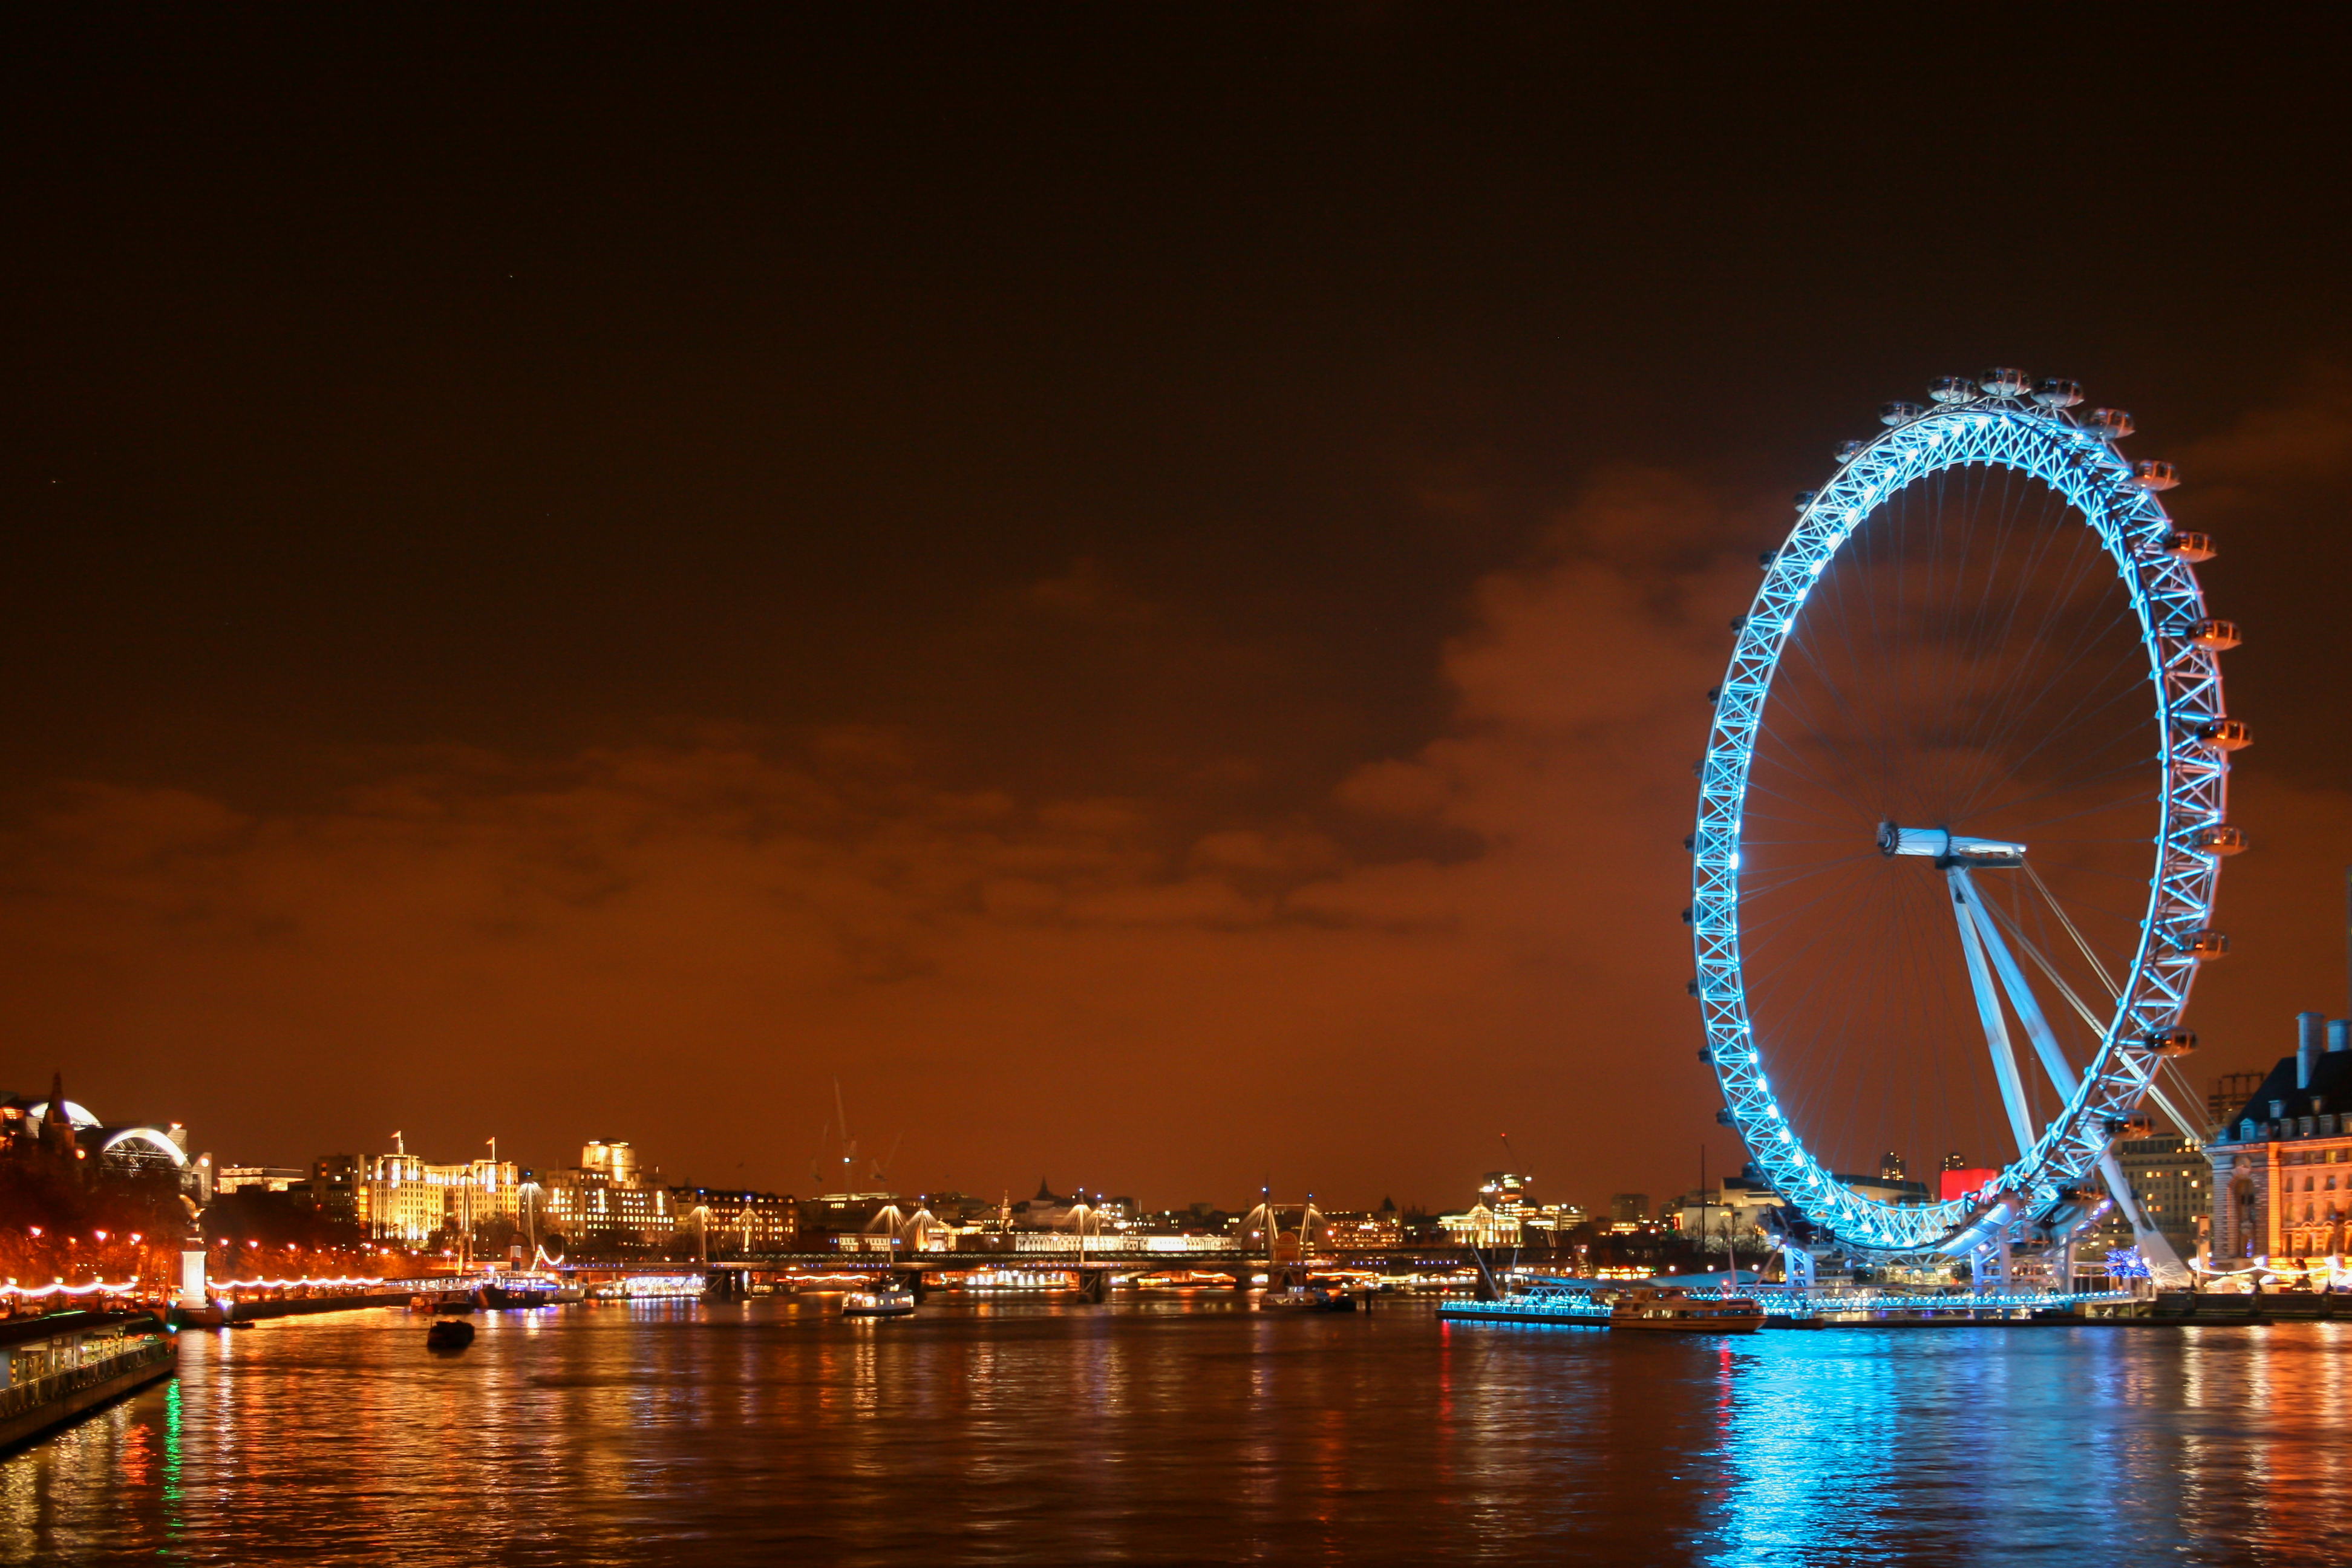 london eye by night - photo #3